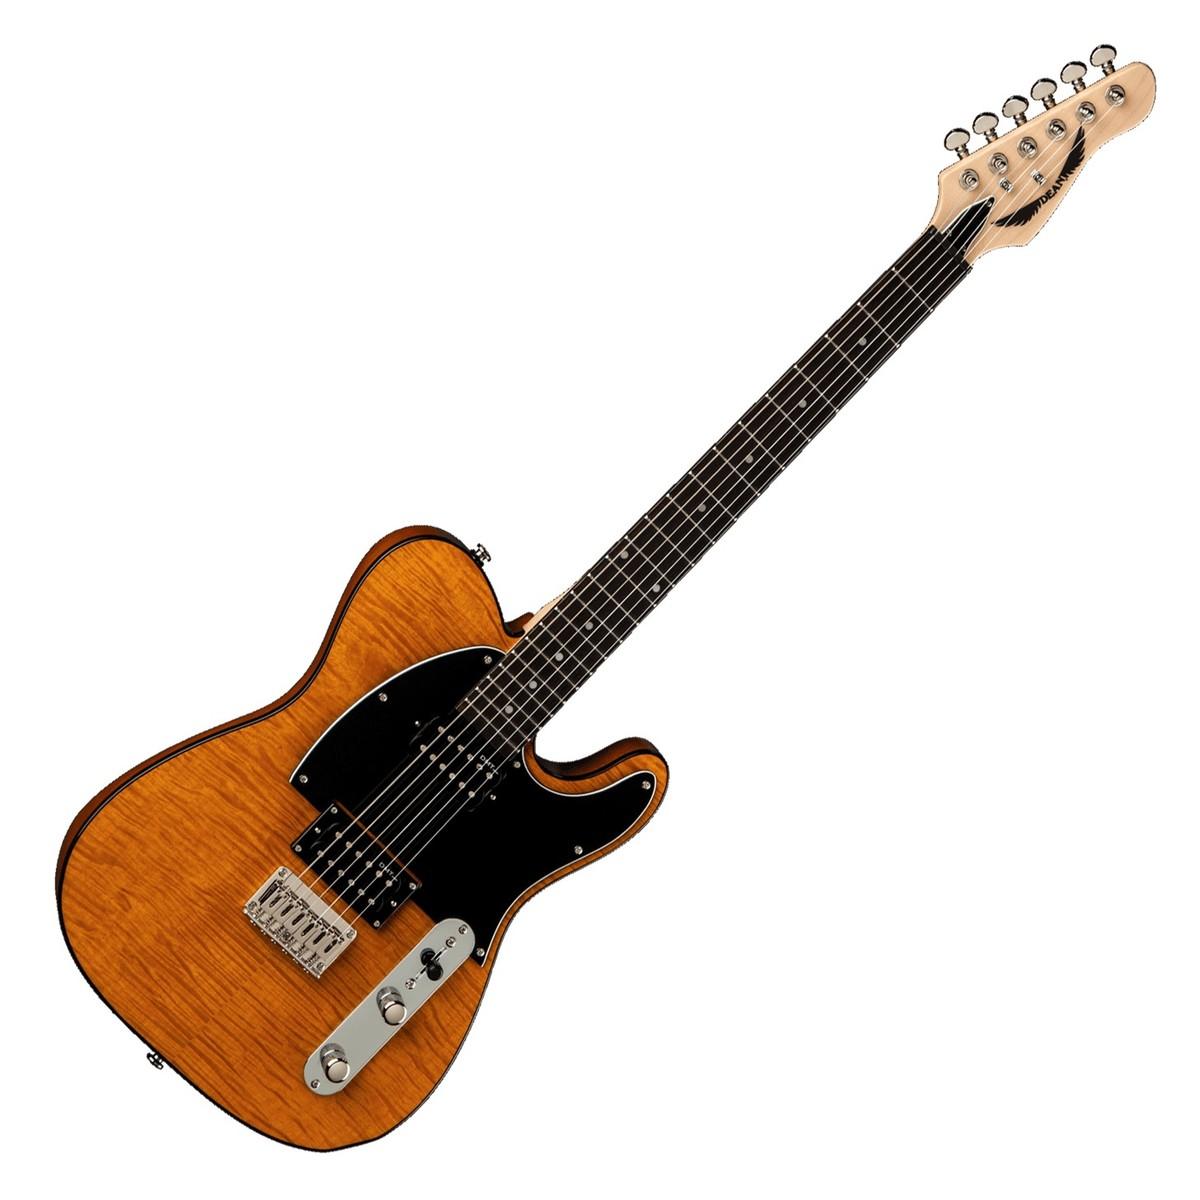 dean nashvegas select electric guitar trans amber at gear4music. Black Bedroom Furniture Sets. Home Design Ideas